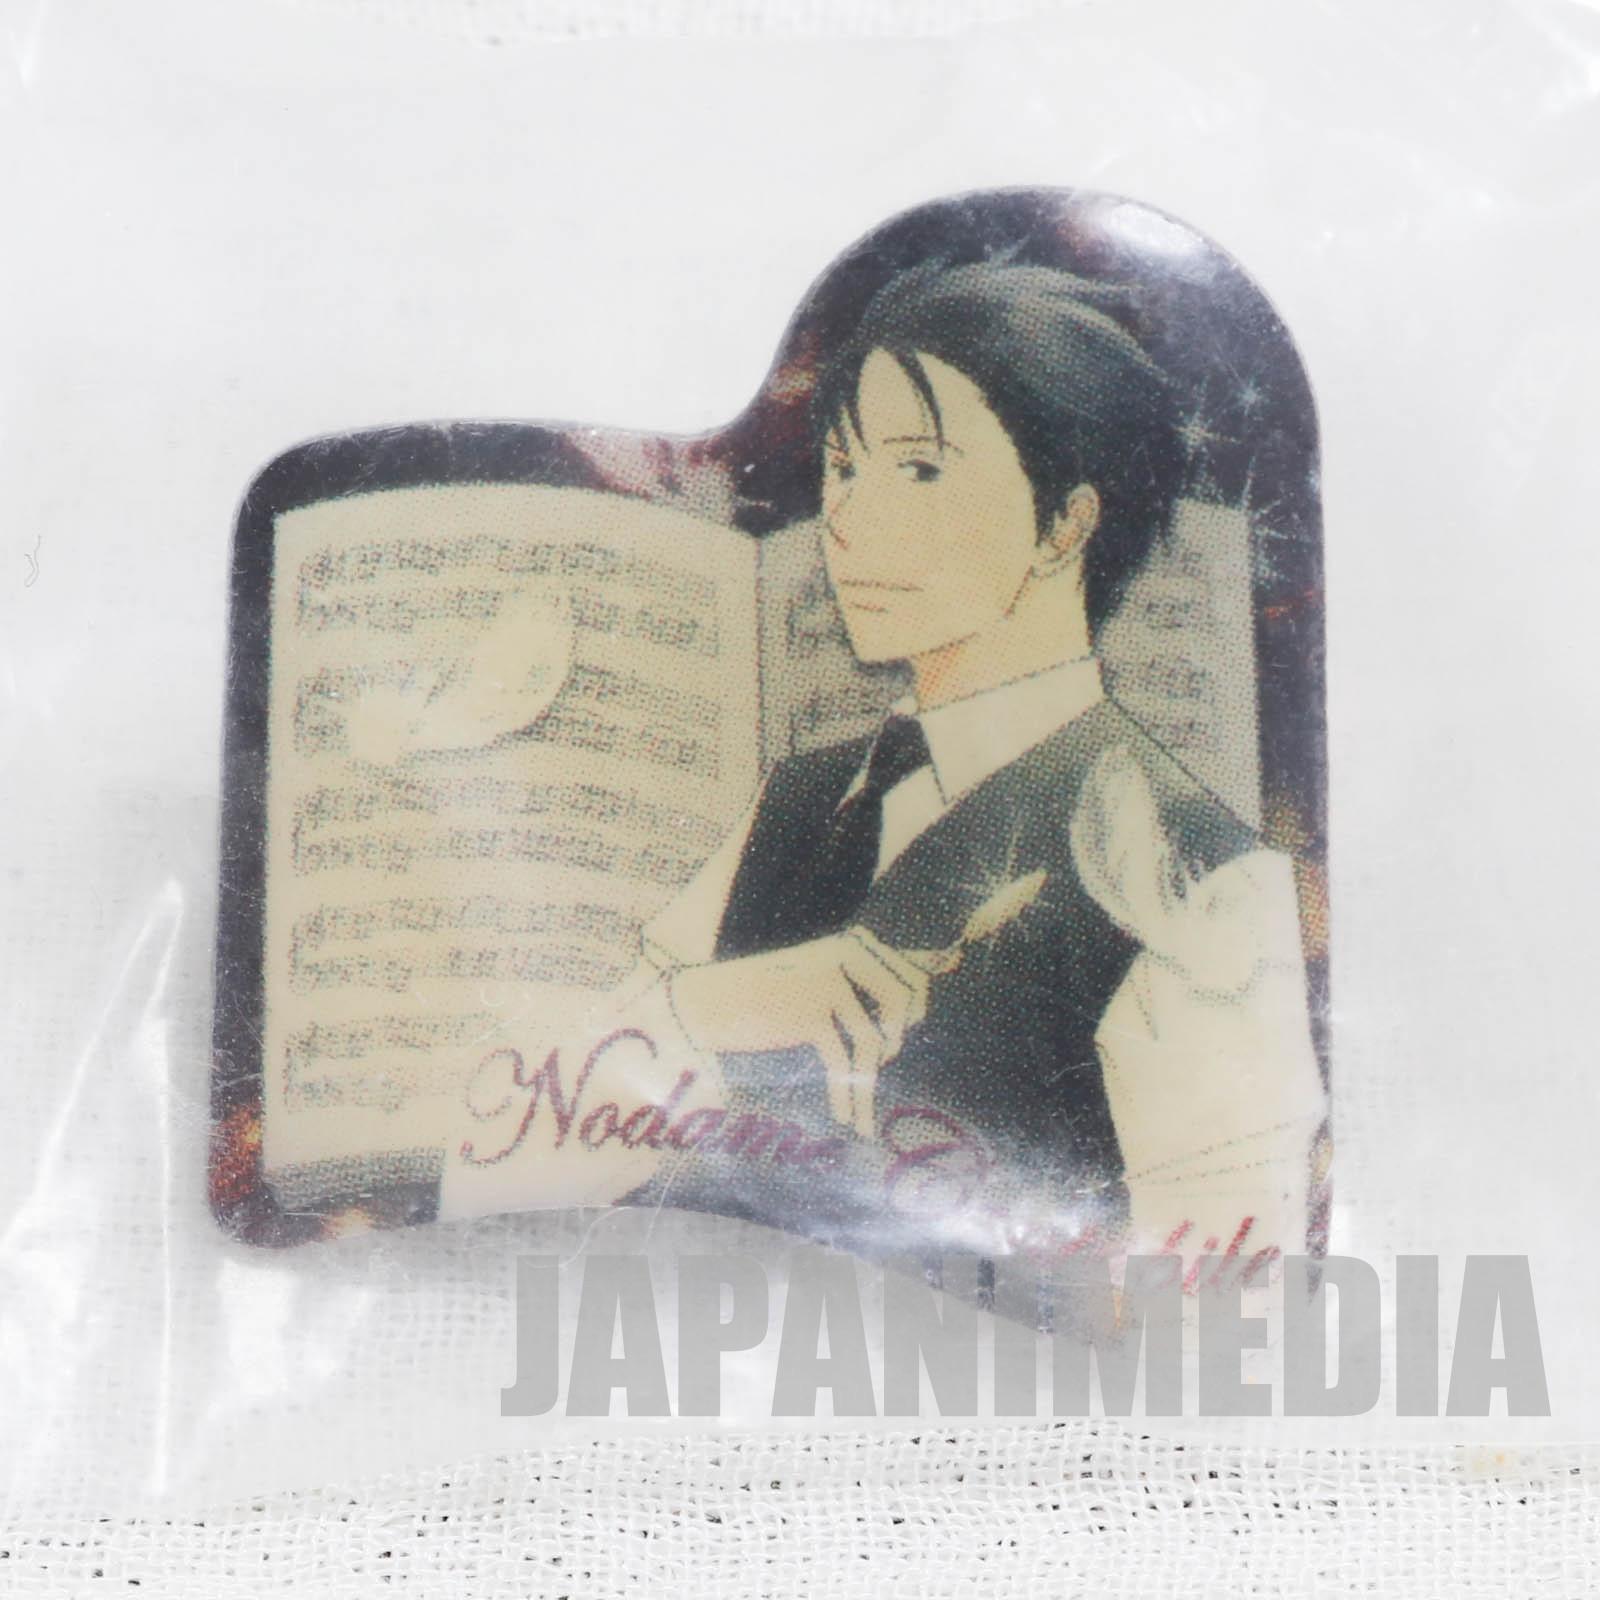 Nodame Cantabile Shinichi Chiaki Gashapon Pins Collection JAPAN ANIME